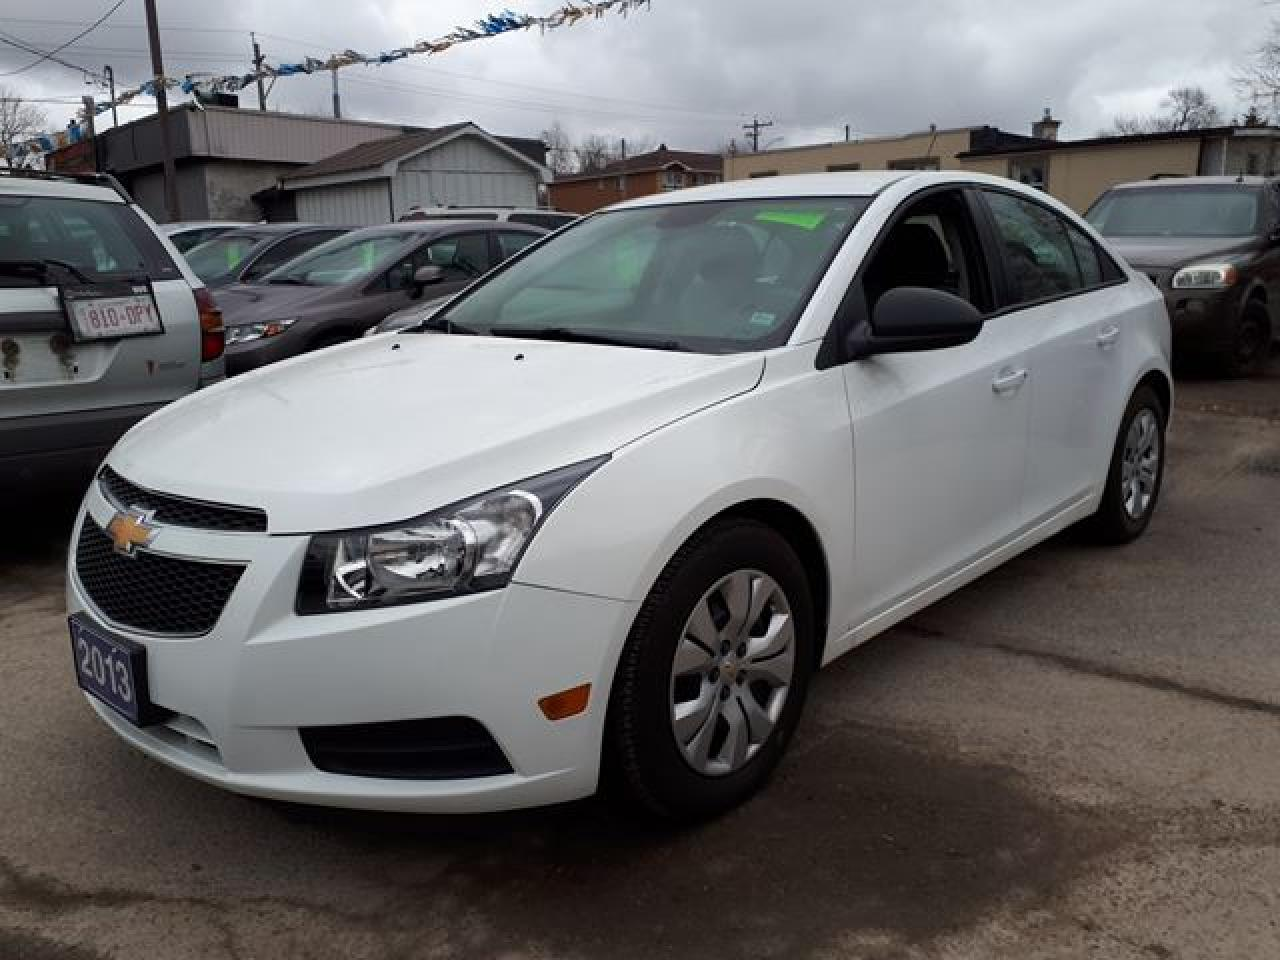 Photo of White 2013 Chevrolet Cruze